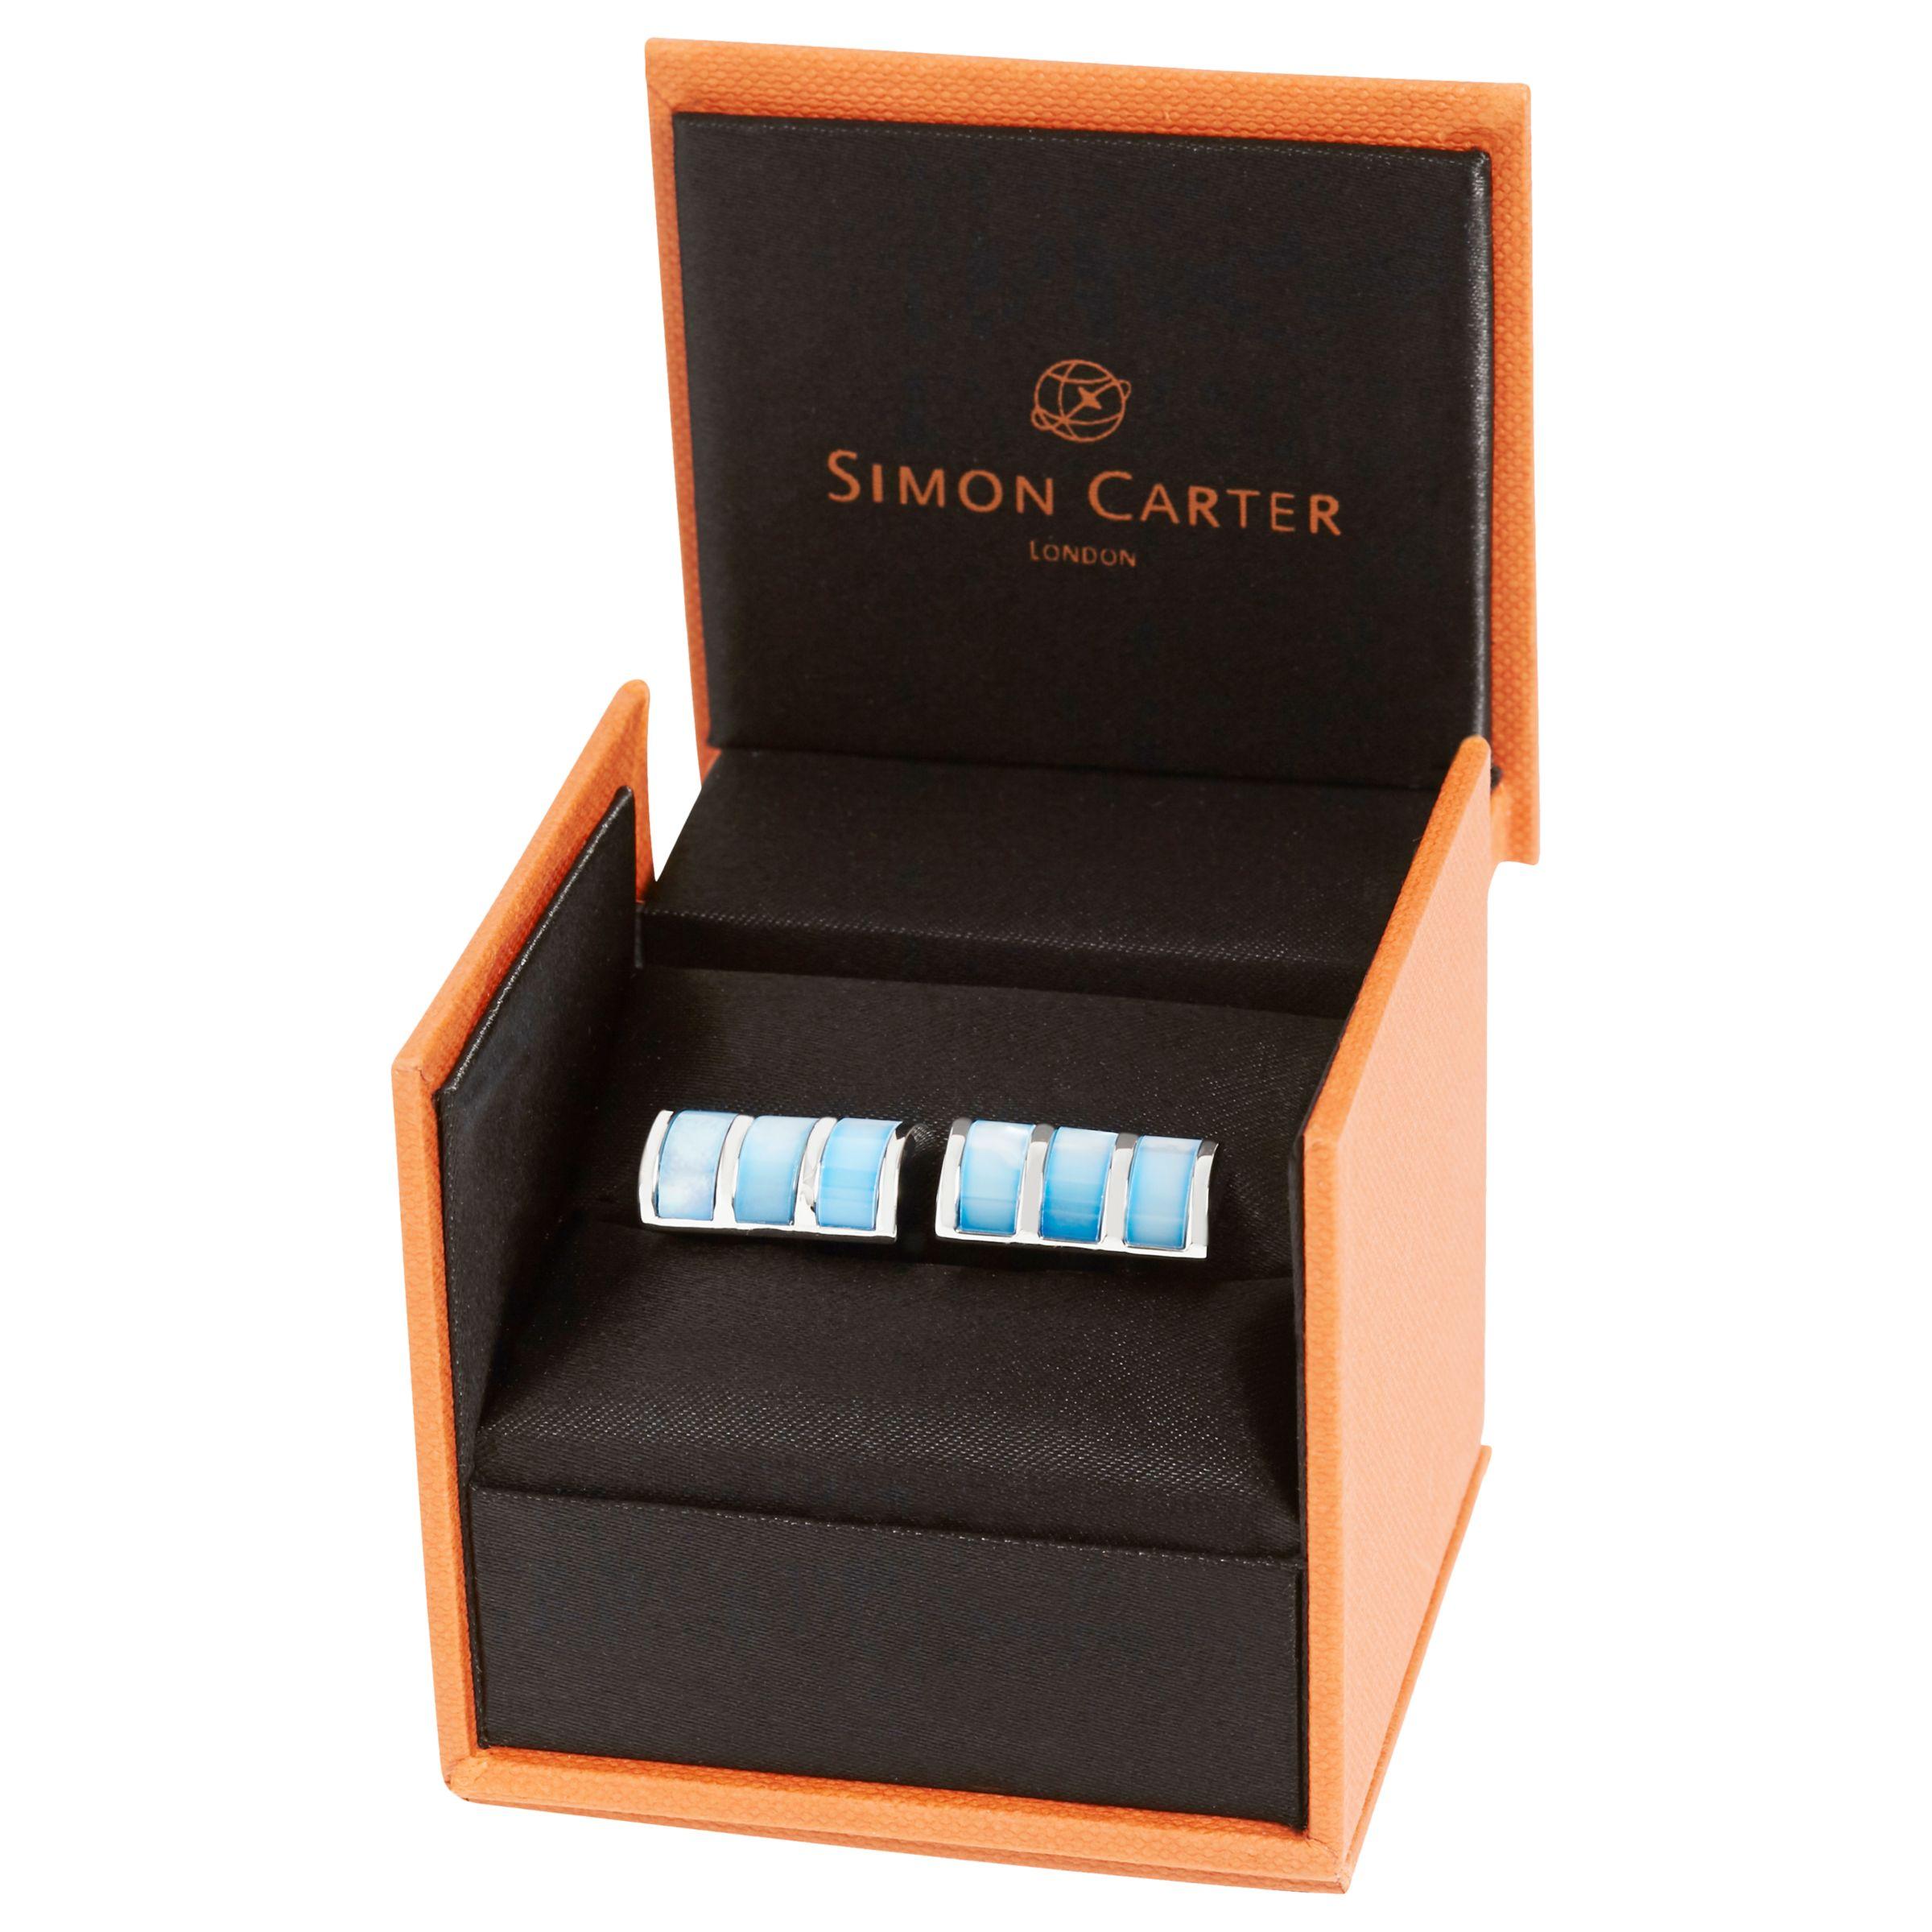 Simon Carter Simon Carter Mother of Pearl Curve Cufflinks, Blue